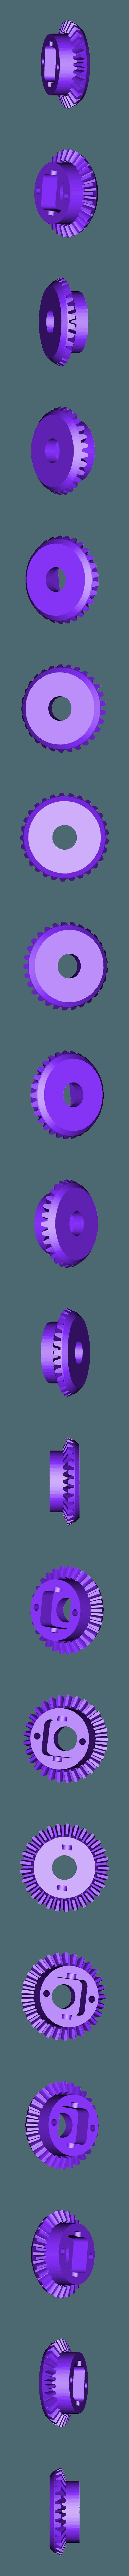 TruckV3_Axle_front_Piniongear.STL Download STL file 3D Printed RC Truck V3 • 3D print model, MrCrankyface